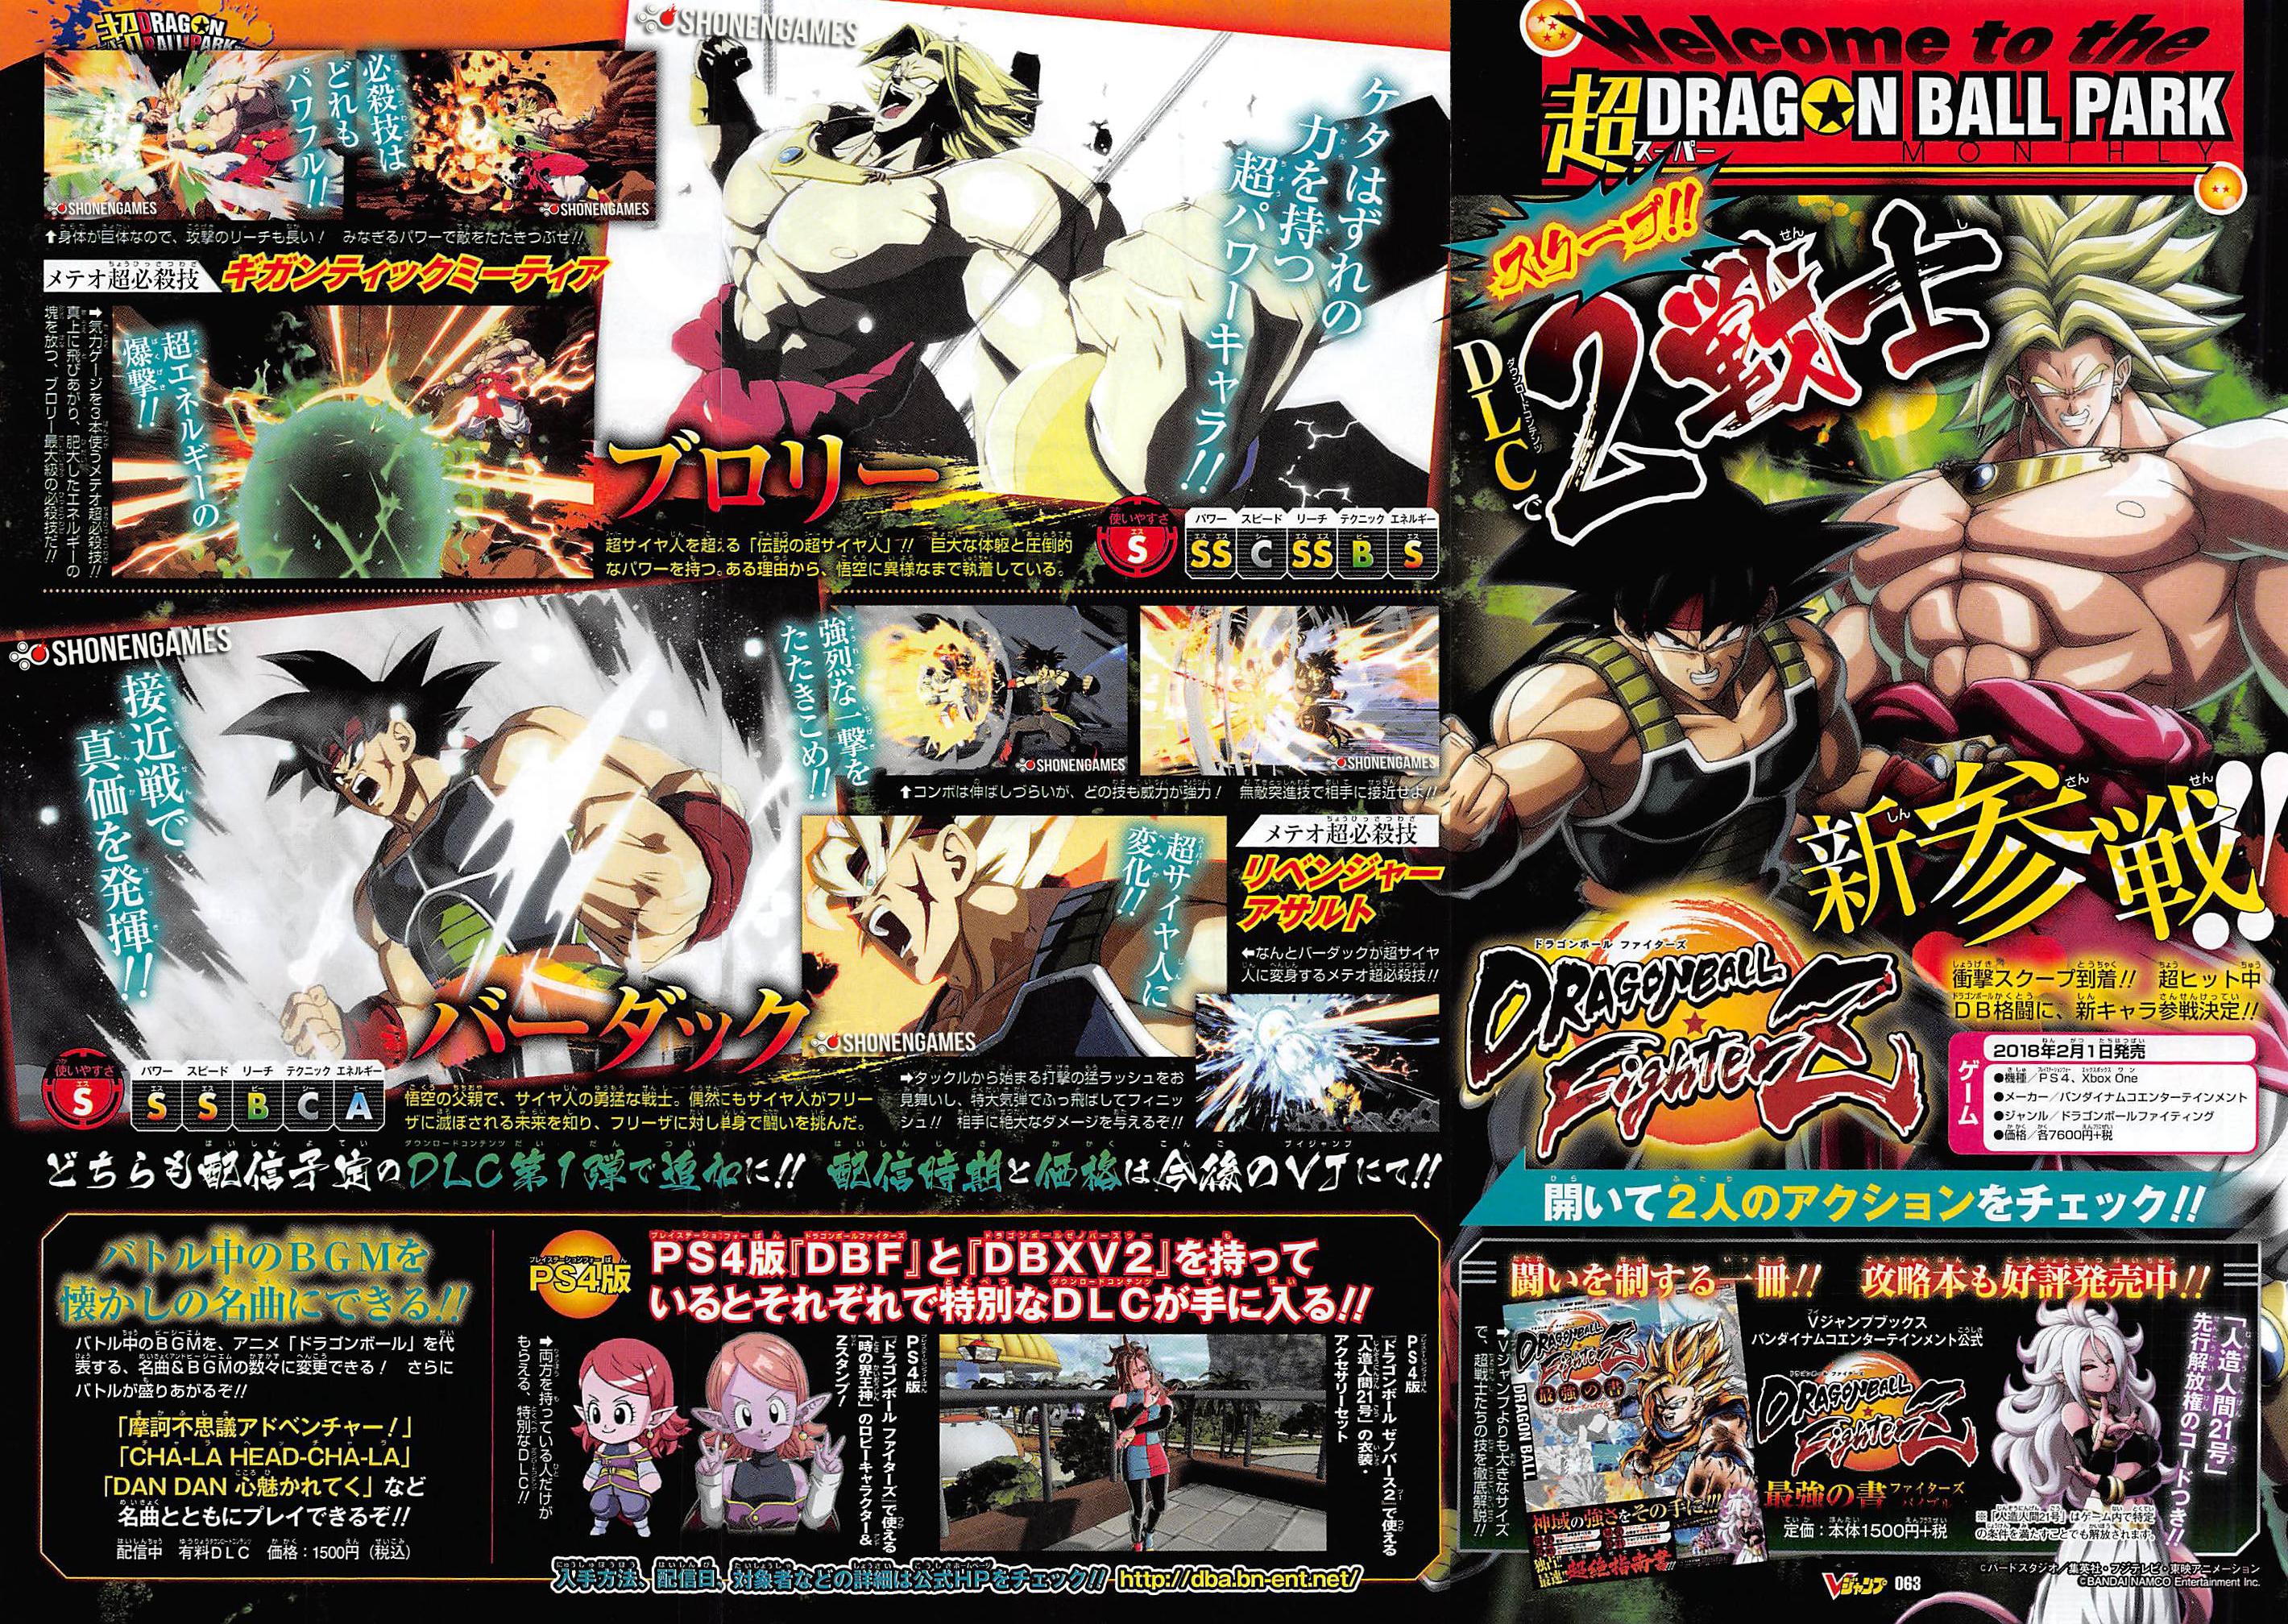 Primeiras imagens oficiais de Broly e Bardock — Dragon Ball FighterZ